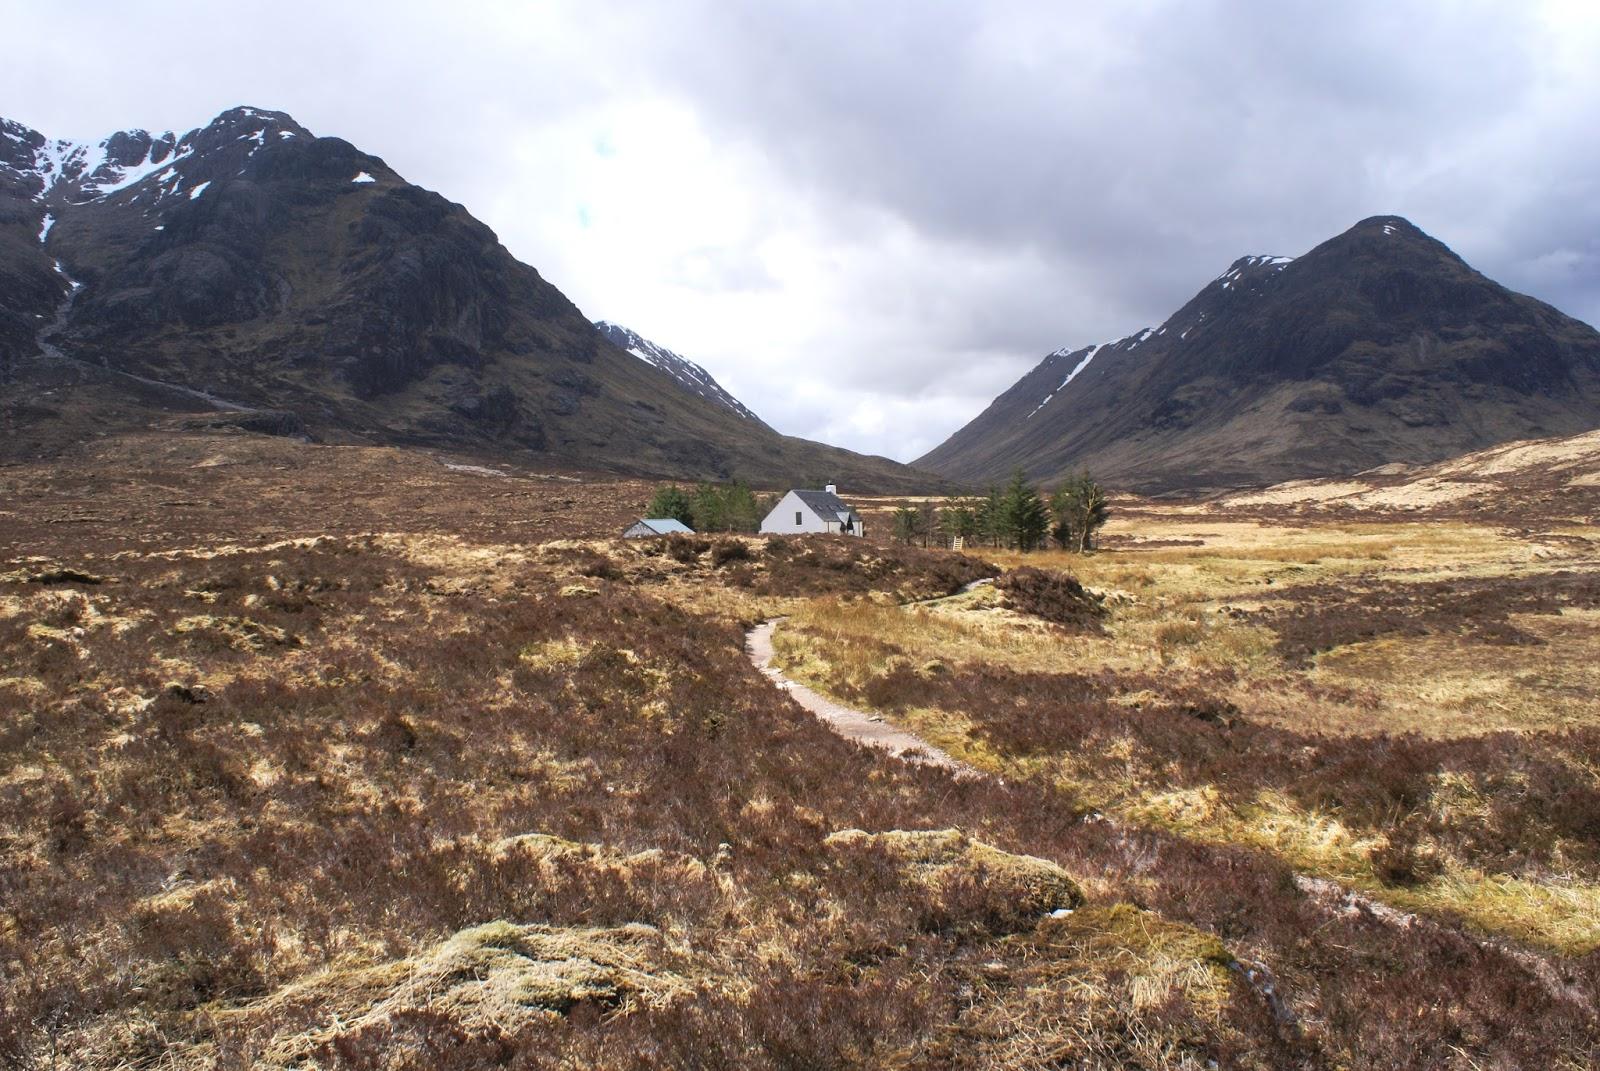 glen coe highlands Altnafeadh scotland united kingdom uk